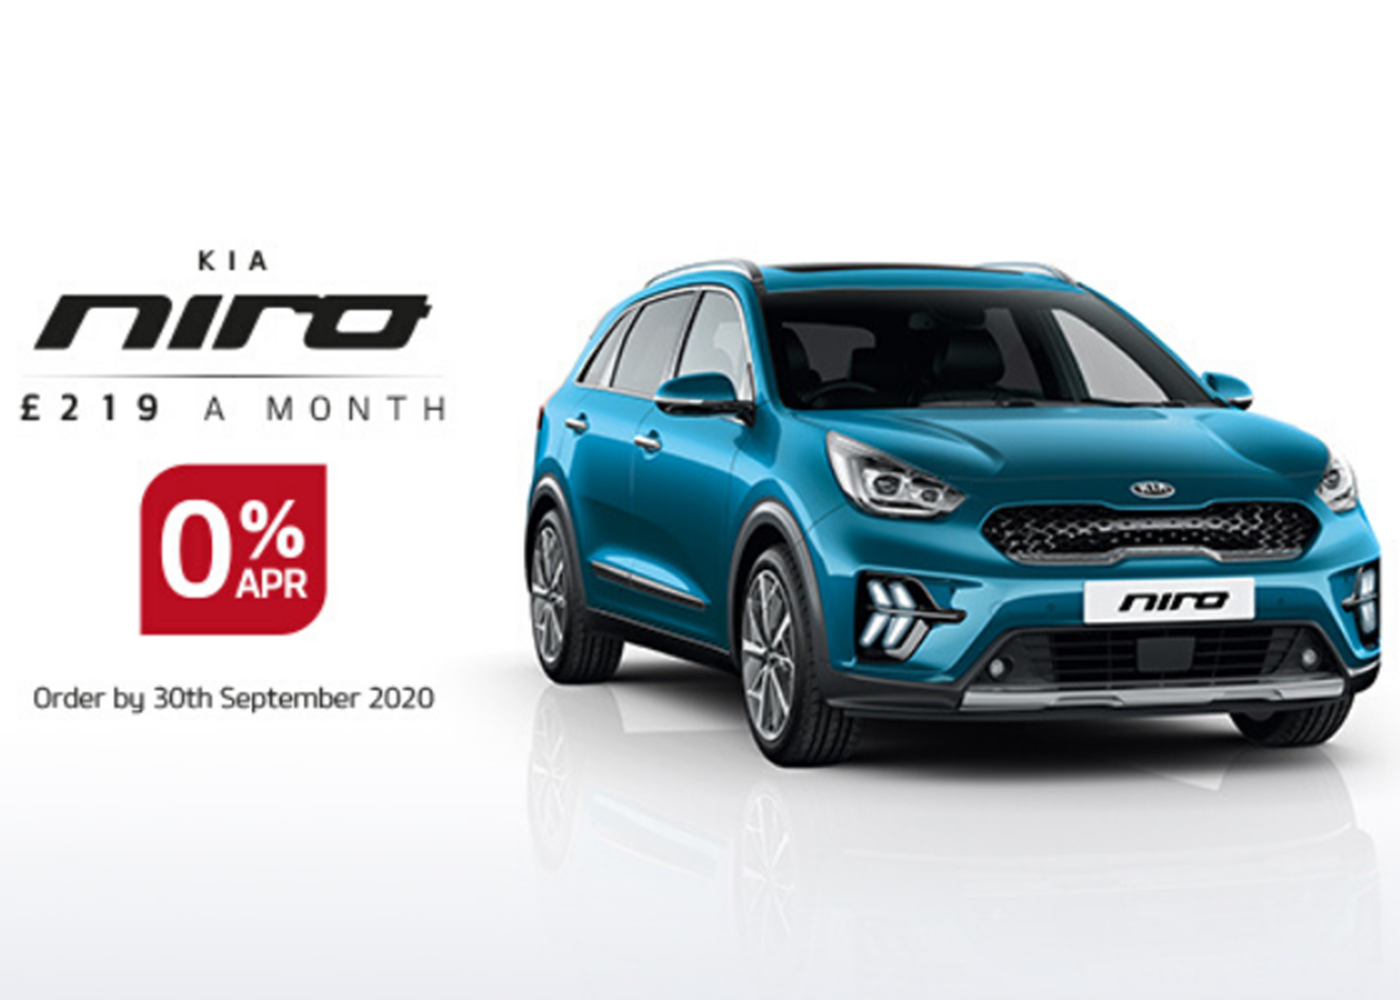 Kia Niro with 0% APR at Chippenham Motor Company